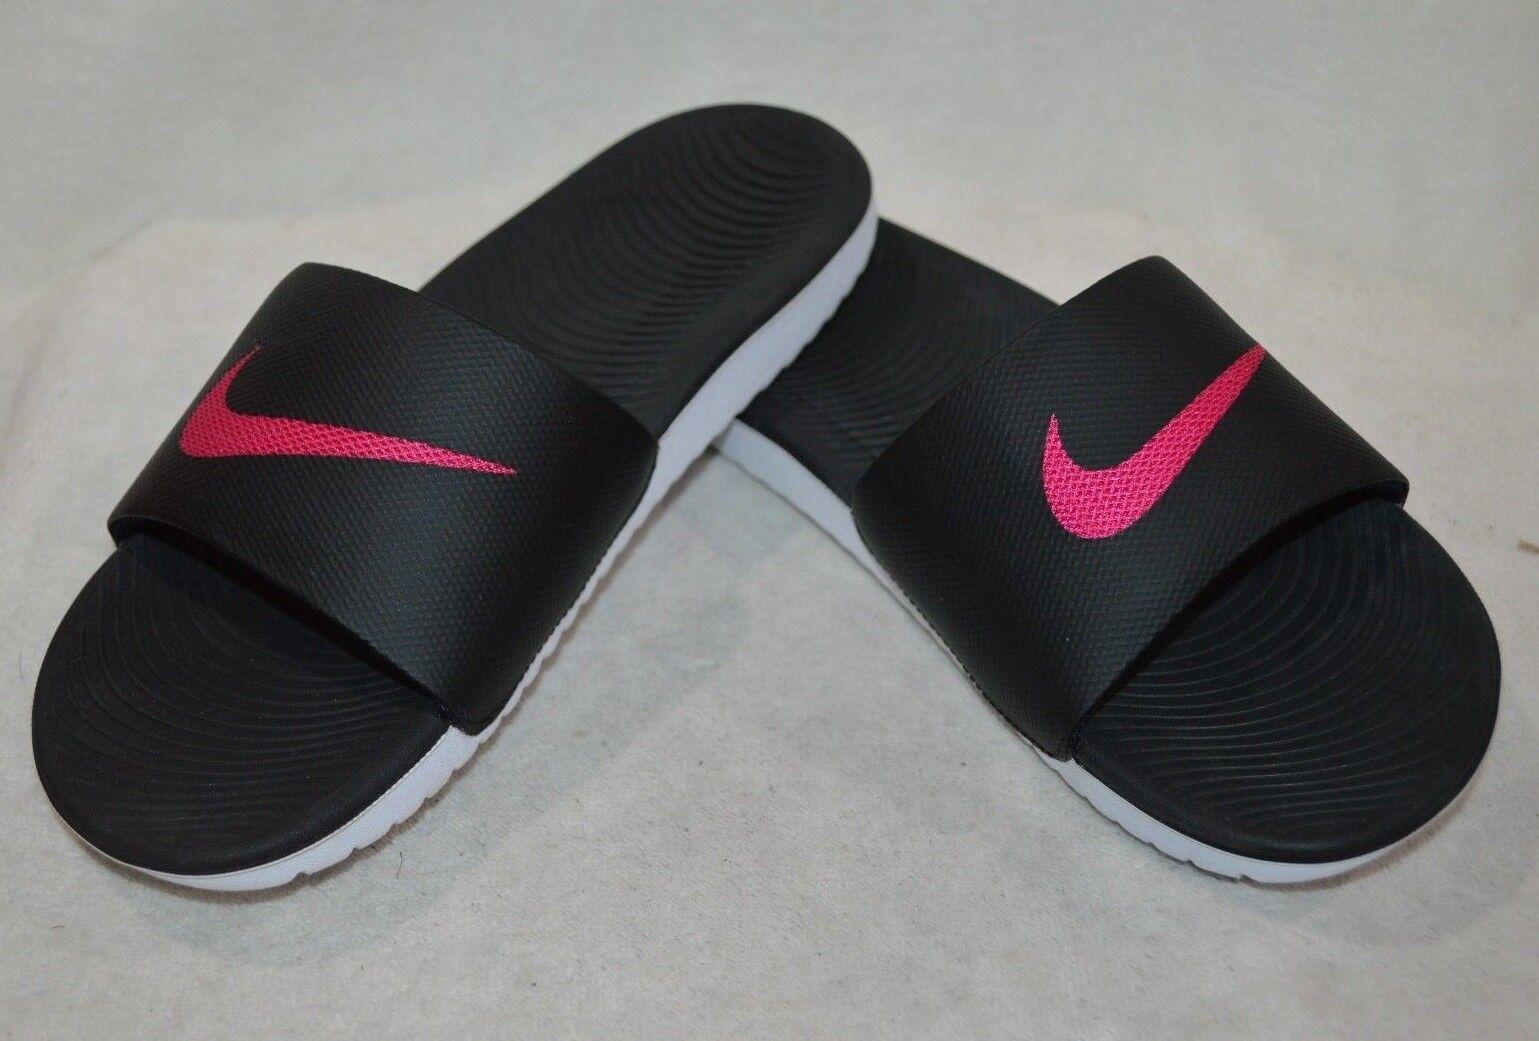 Nike Women's Kawa Black/Pink Slide Sandals - Size 7/10 NWB (834588-060)